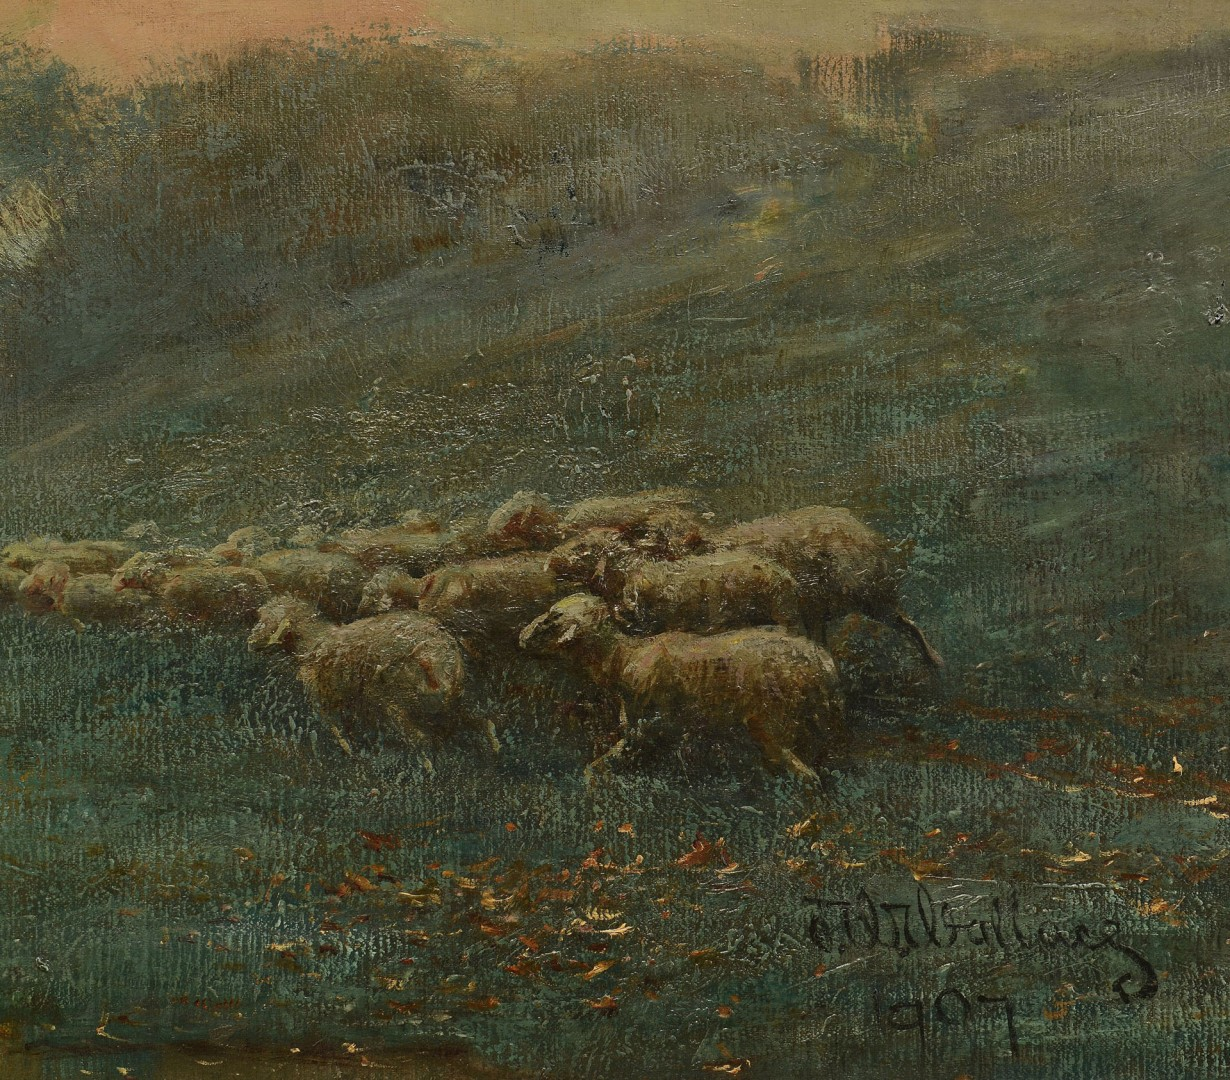 Large East TN Pastoral Landscape, J. W. Wallace, 1907